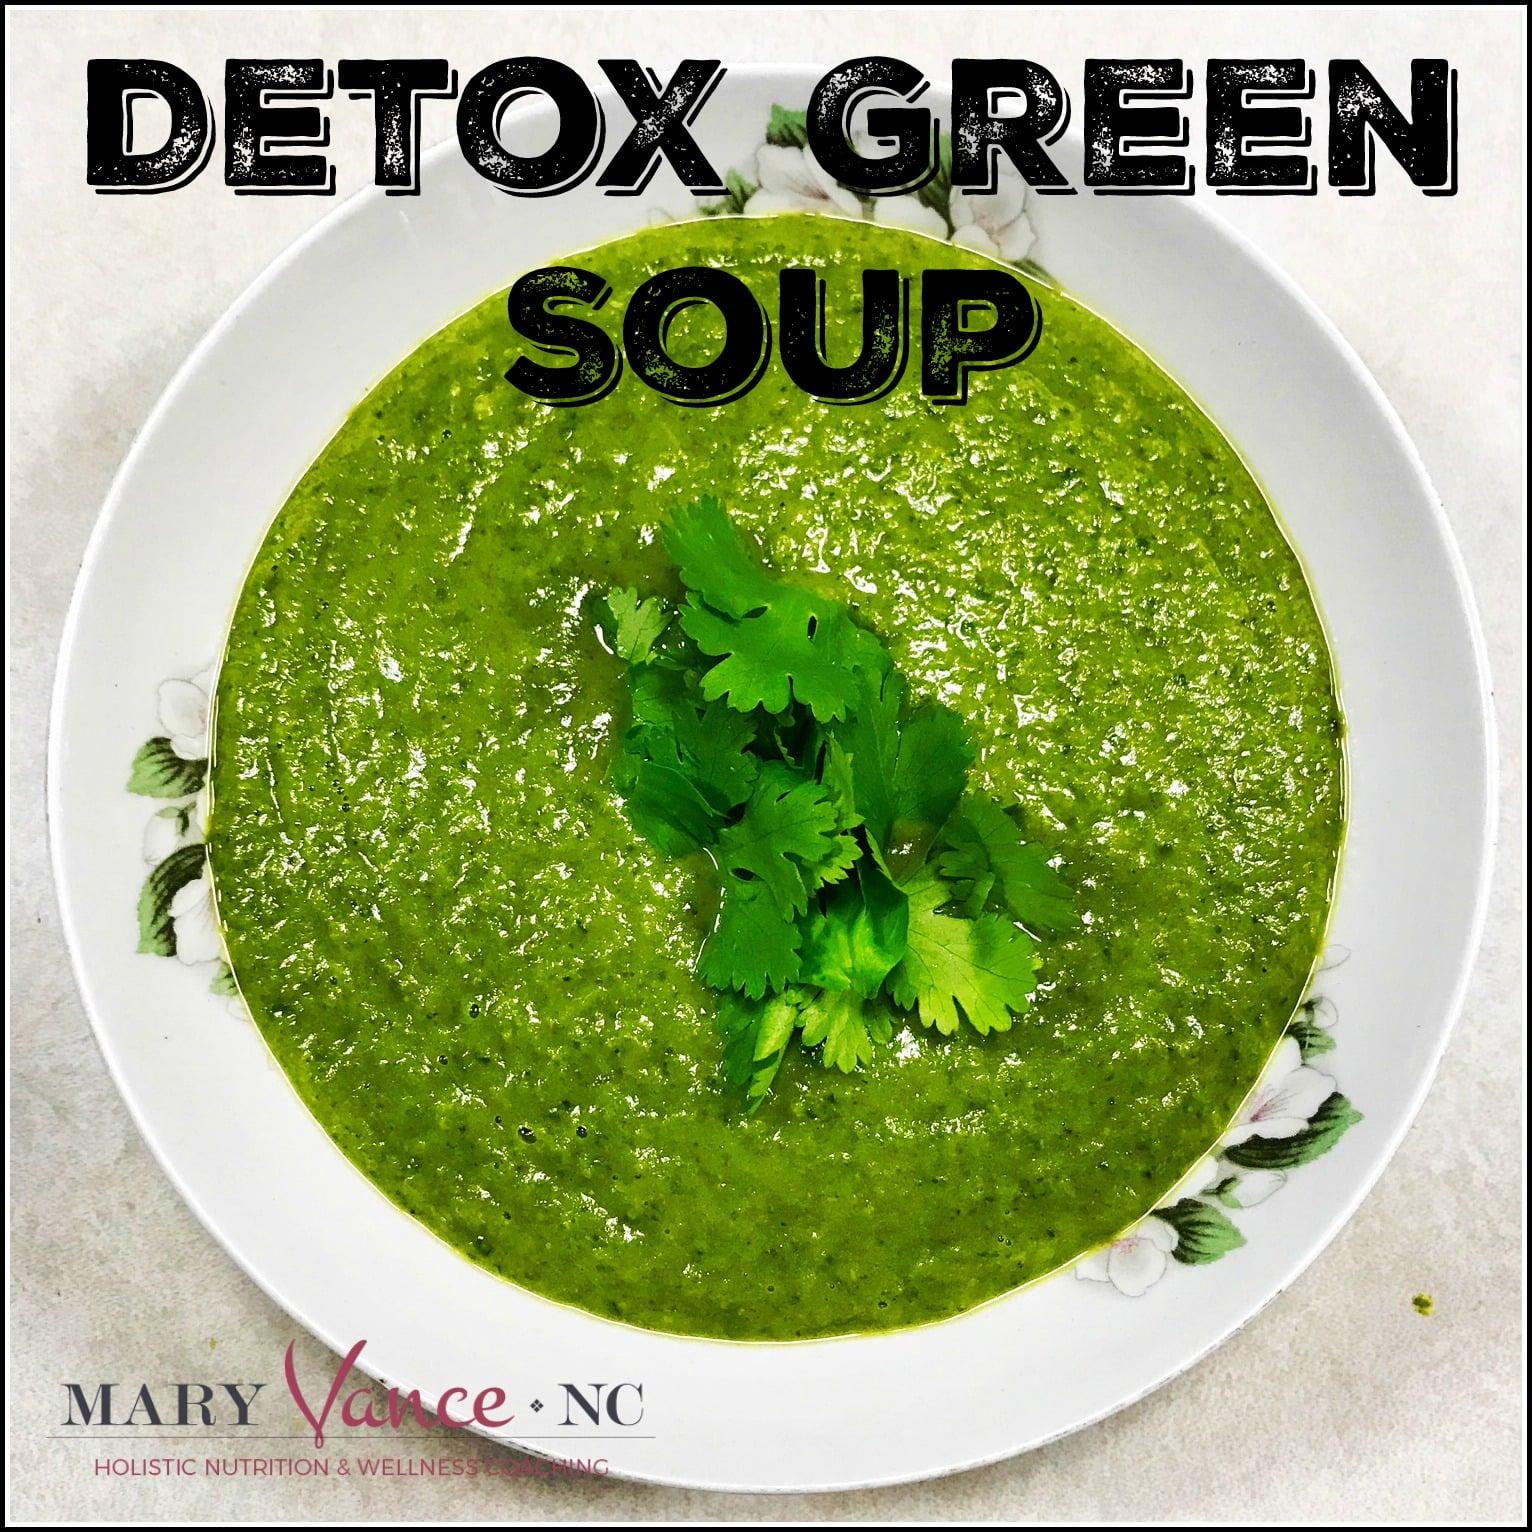 Marvelous Everything But The Kitchen Sink Detox Green Soup Interior Design Ideas Gentotryabchikinfo